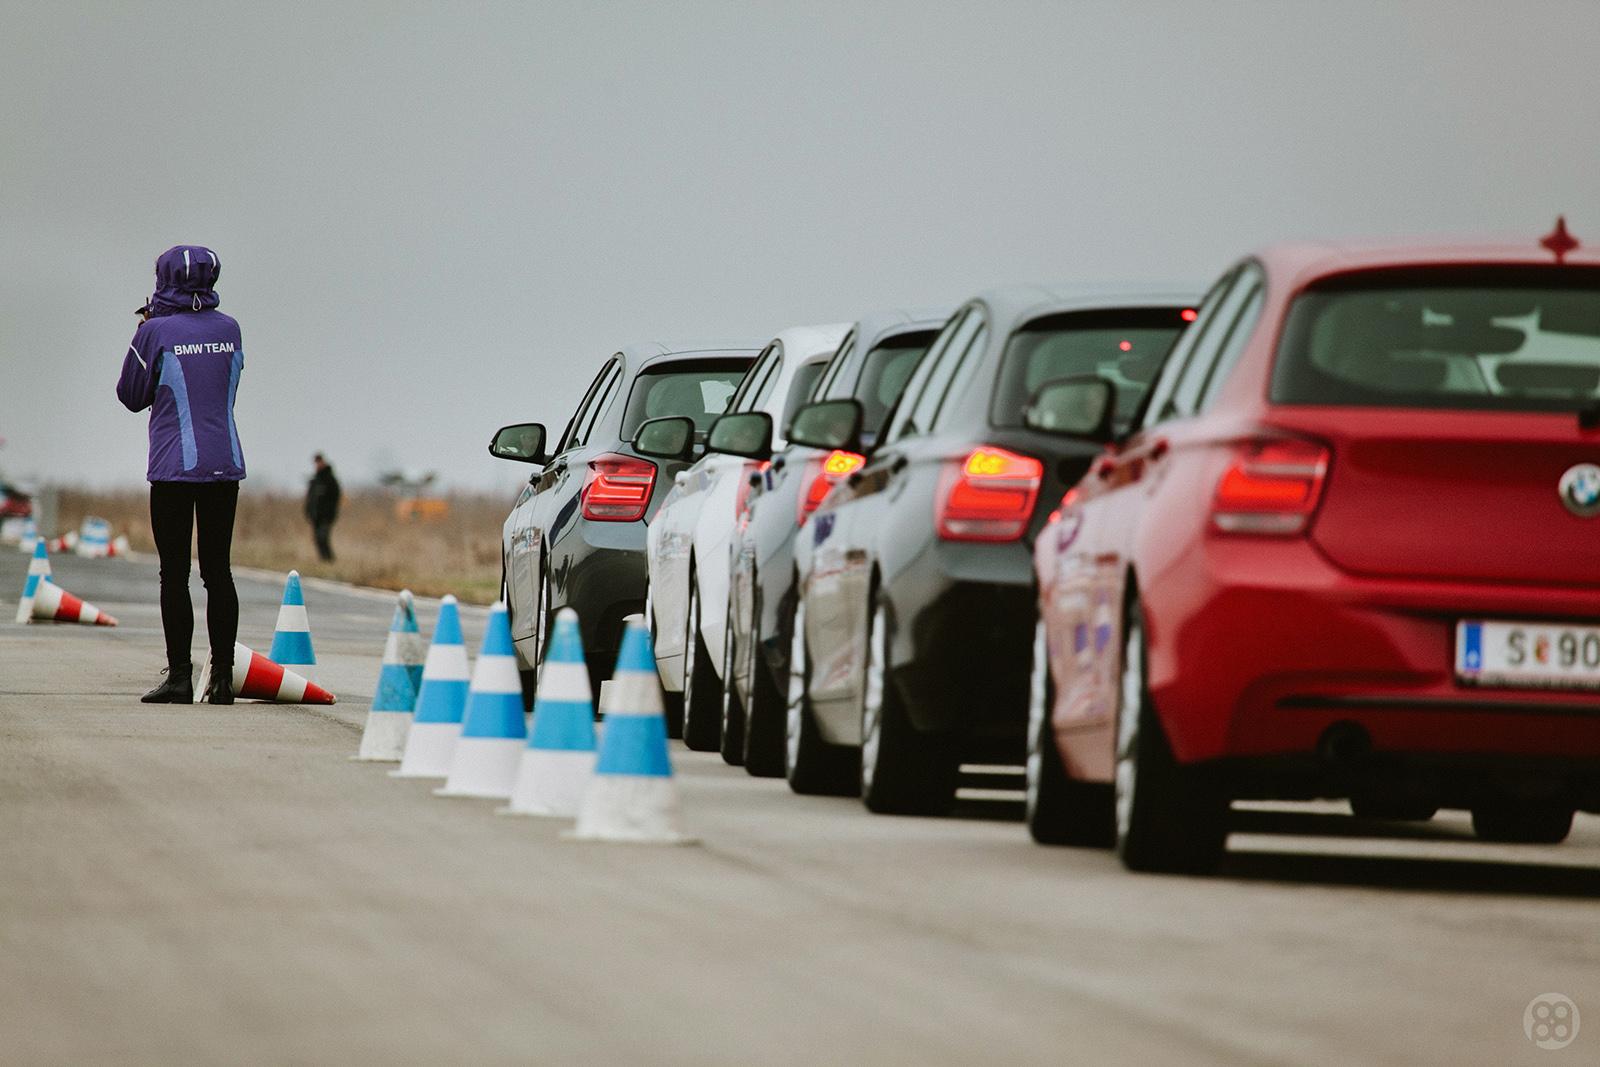 BMW - JDT -site16.jpg